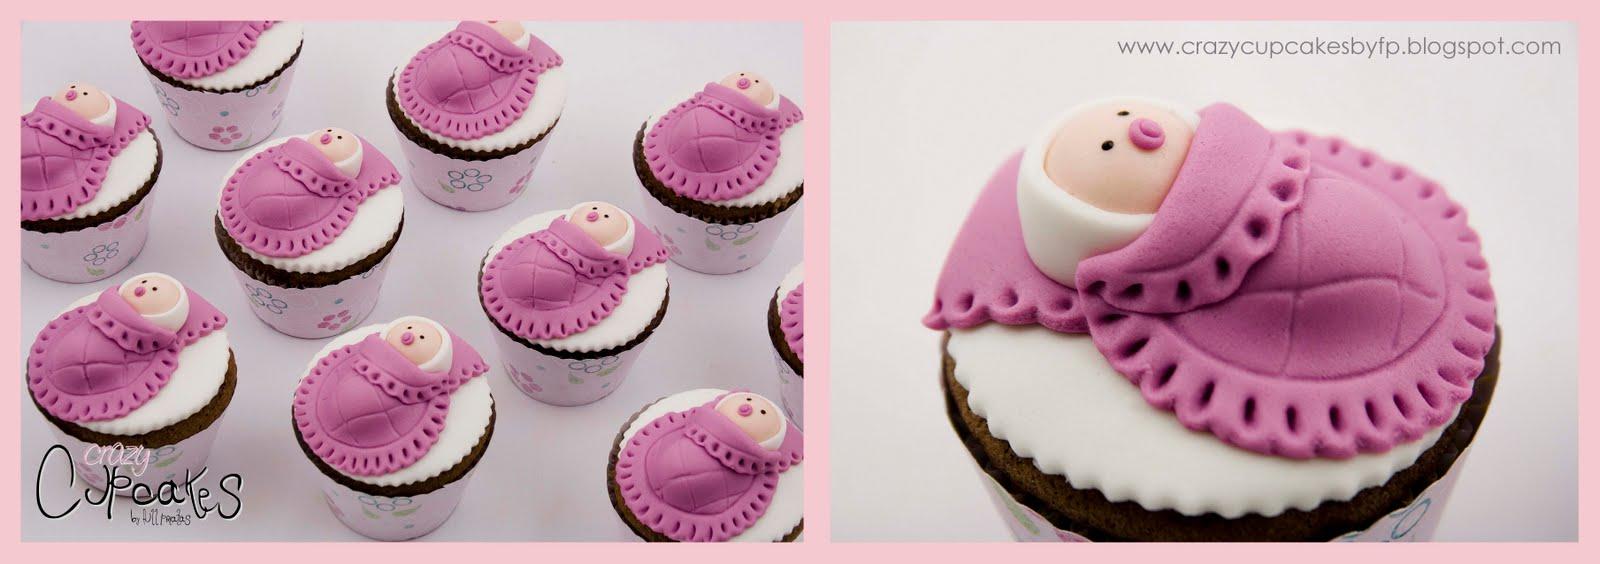 Baby Shower Cupcakes Traffic Club